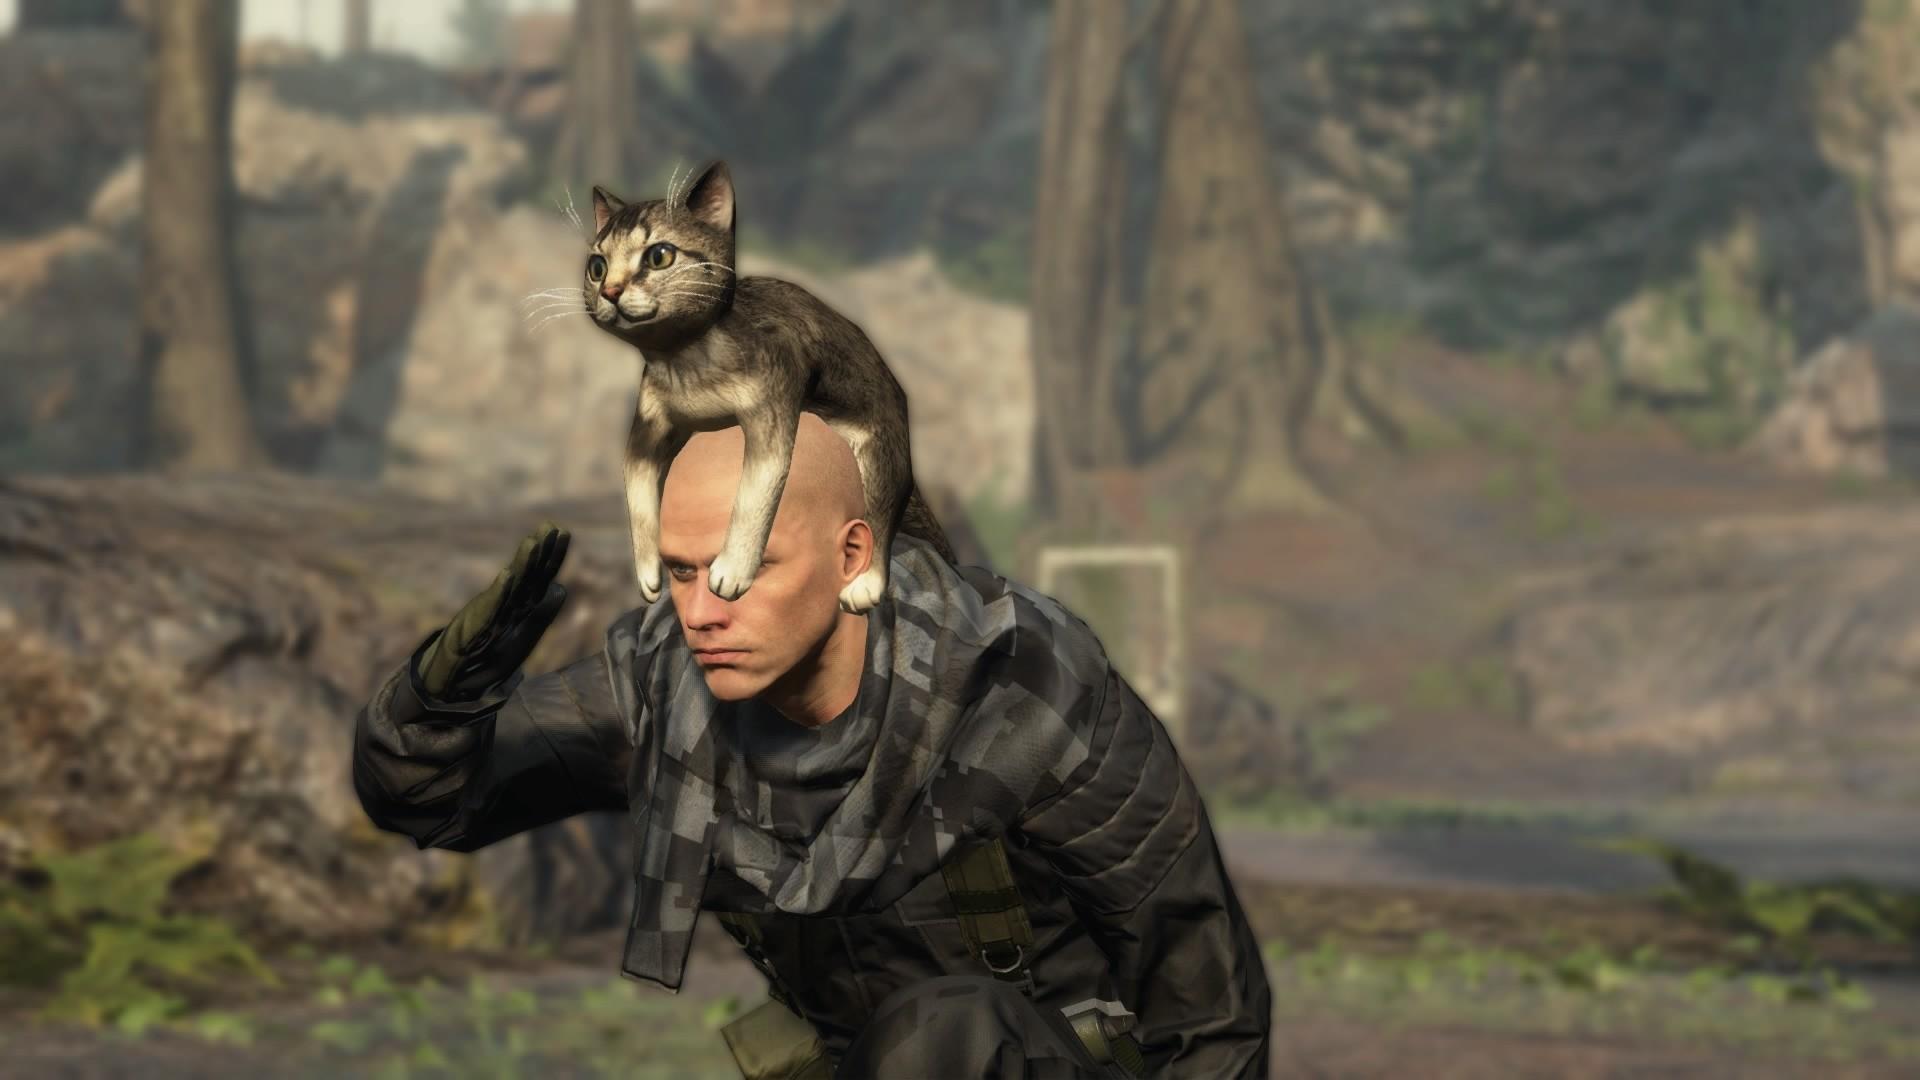 metal_gear_online_november_update_cat_hat_3 ·  metal_gear_online_november_update_cat_hat_2 ·  metal_gear_online_november_update_cat_hat_1